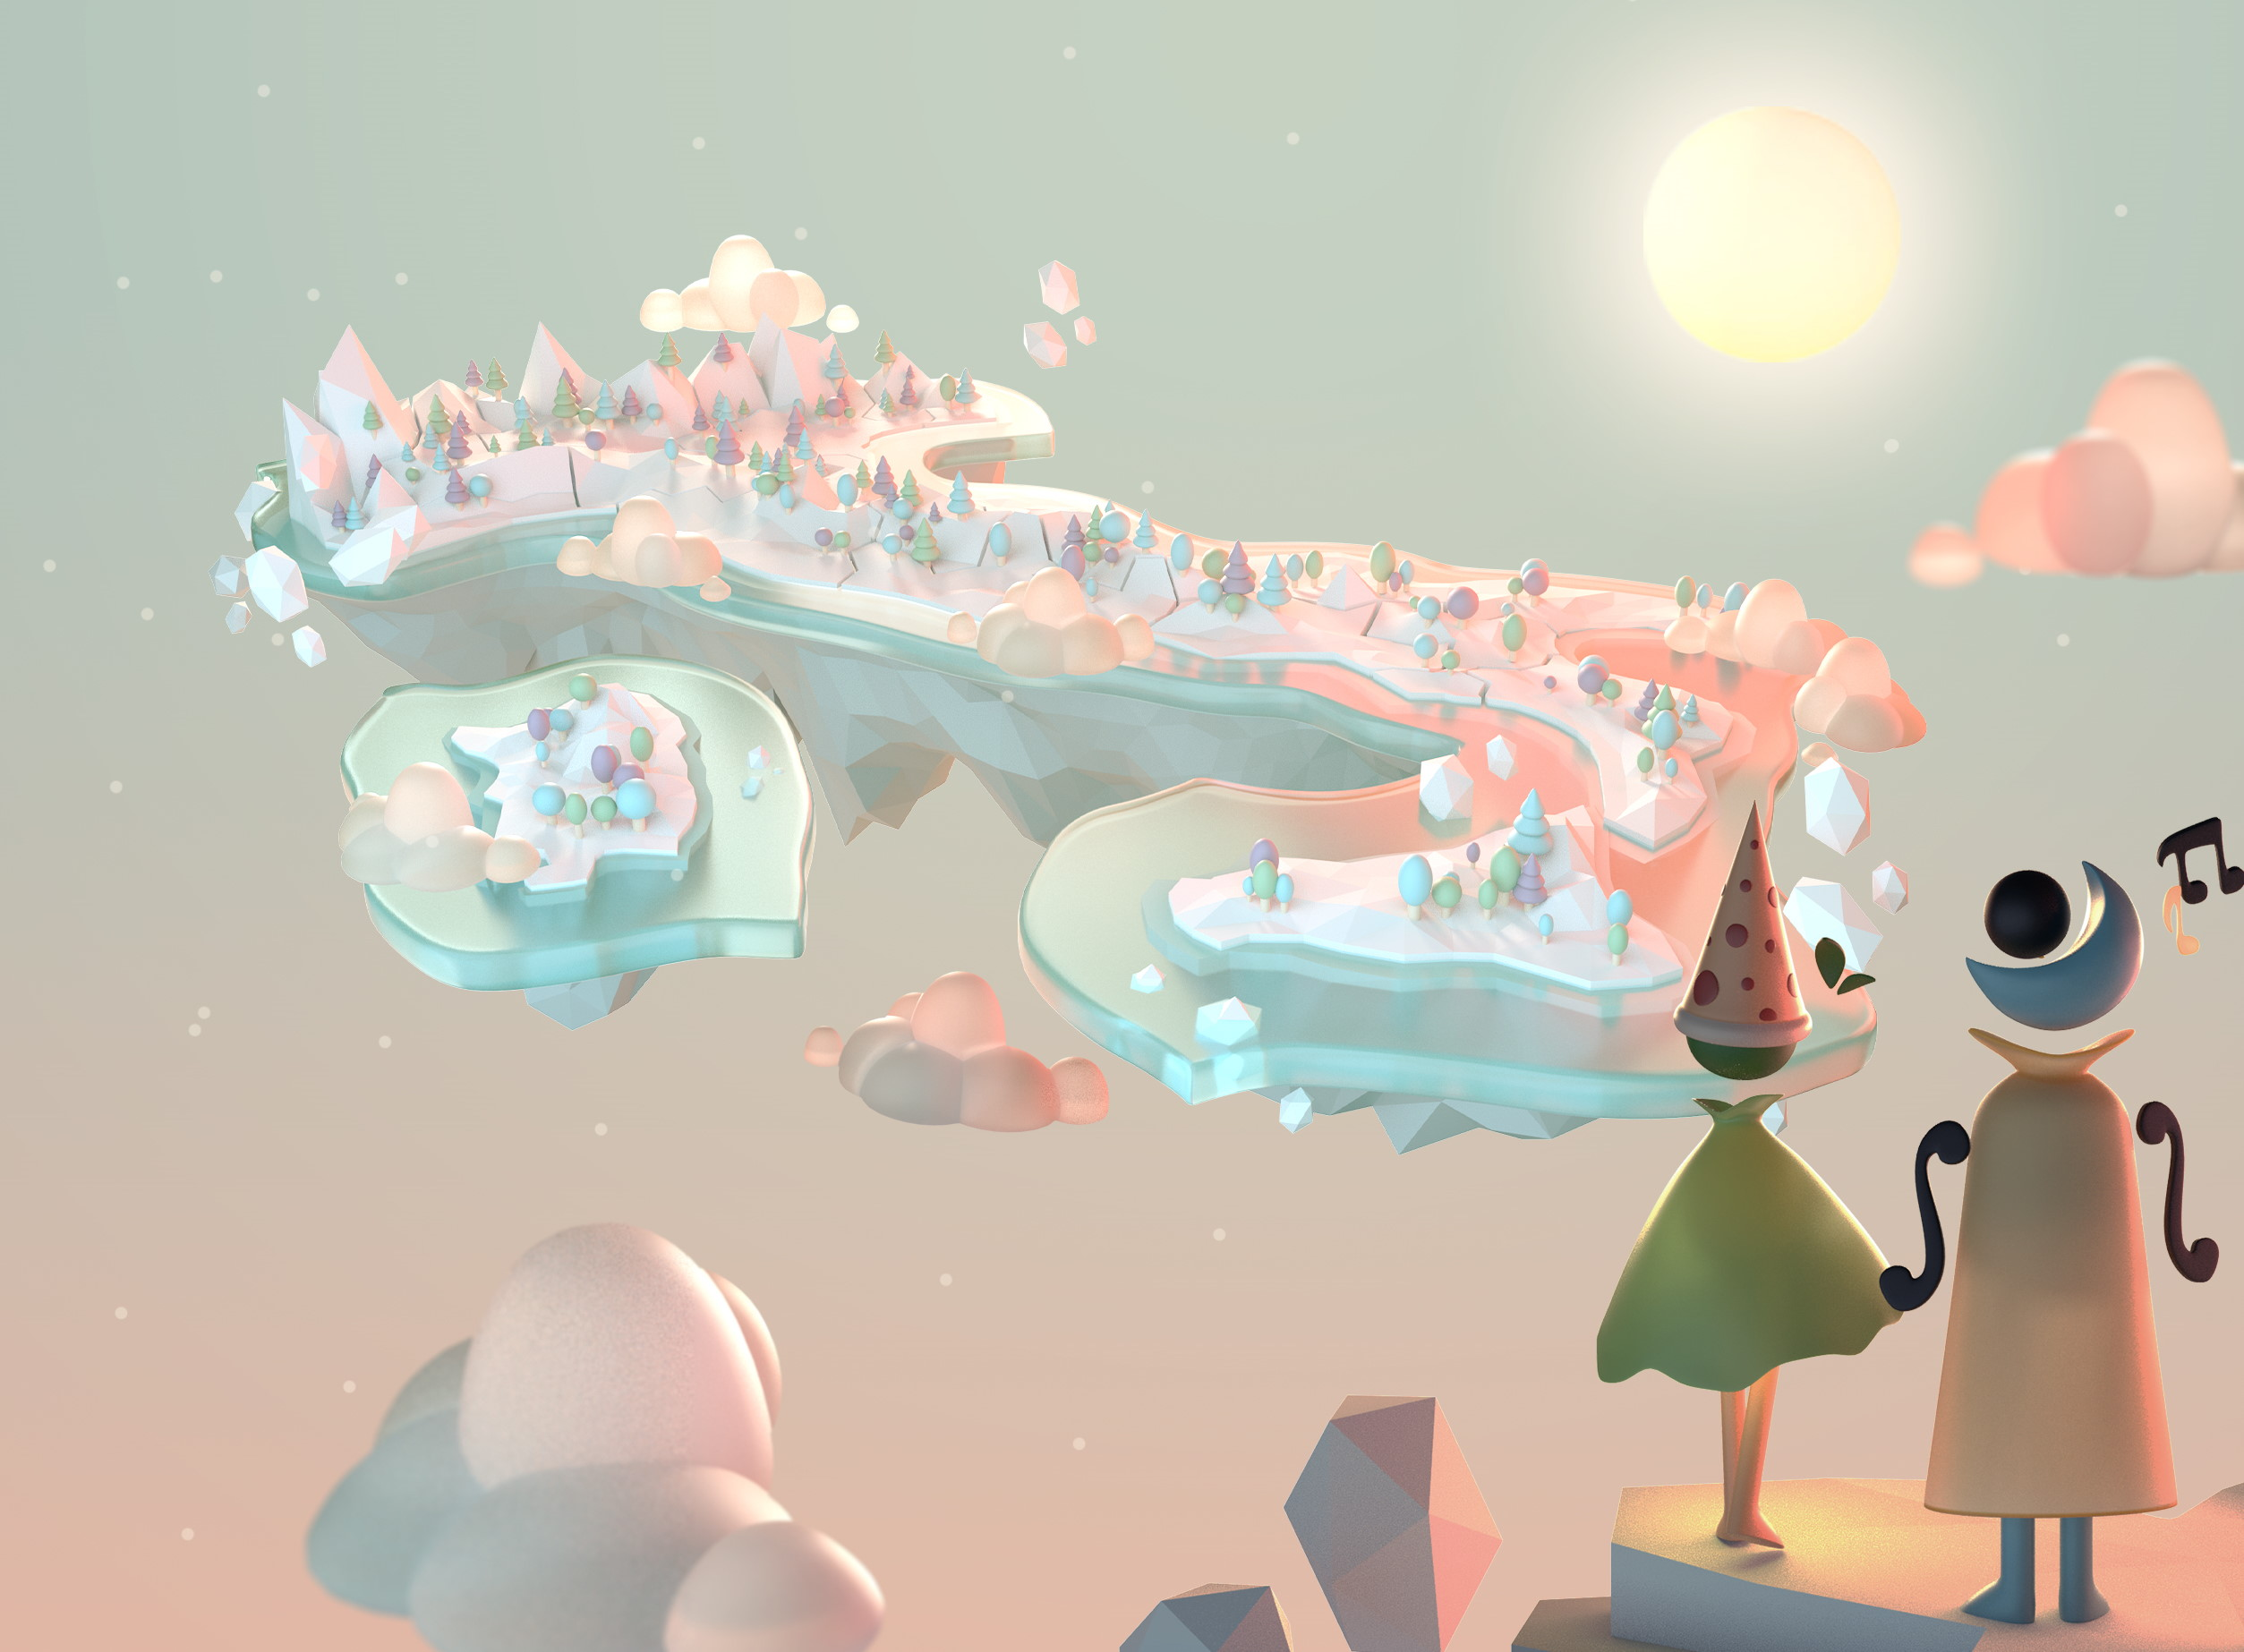 italy land of wonders